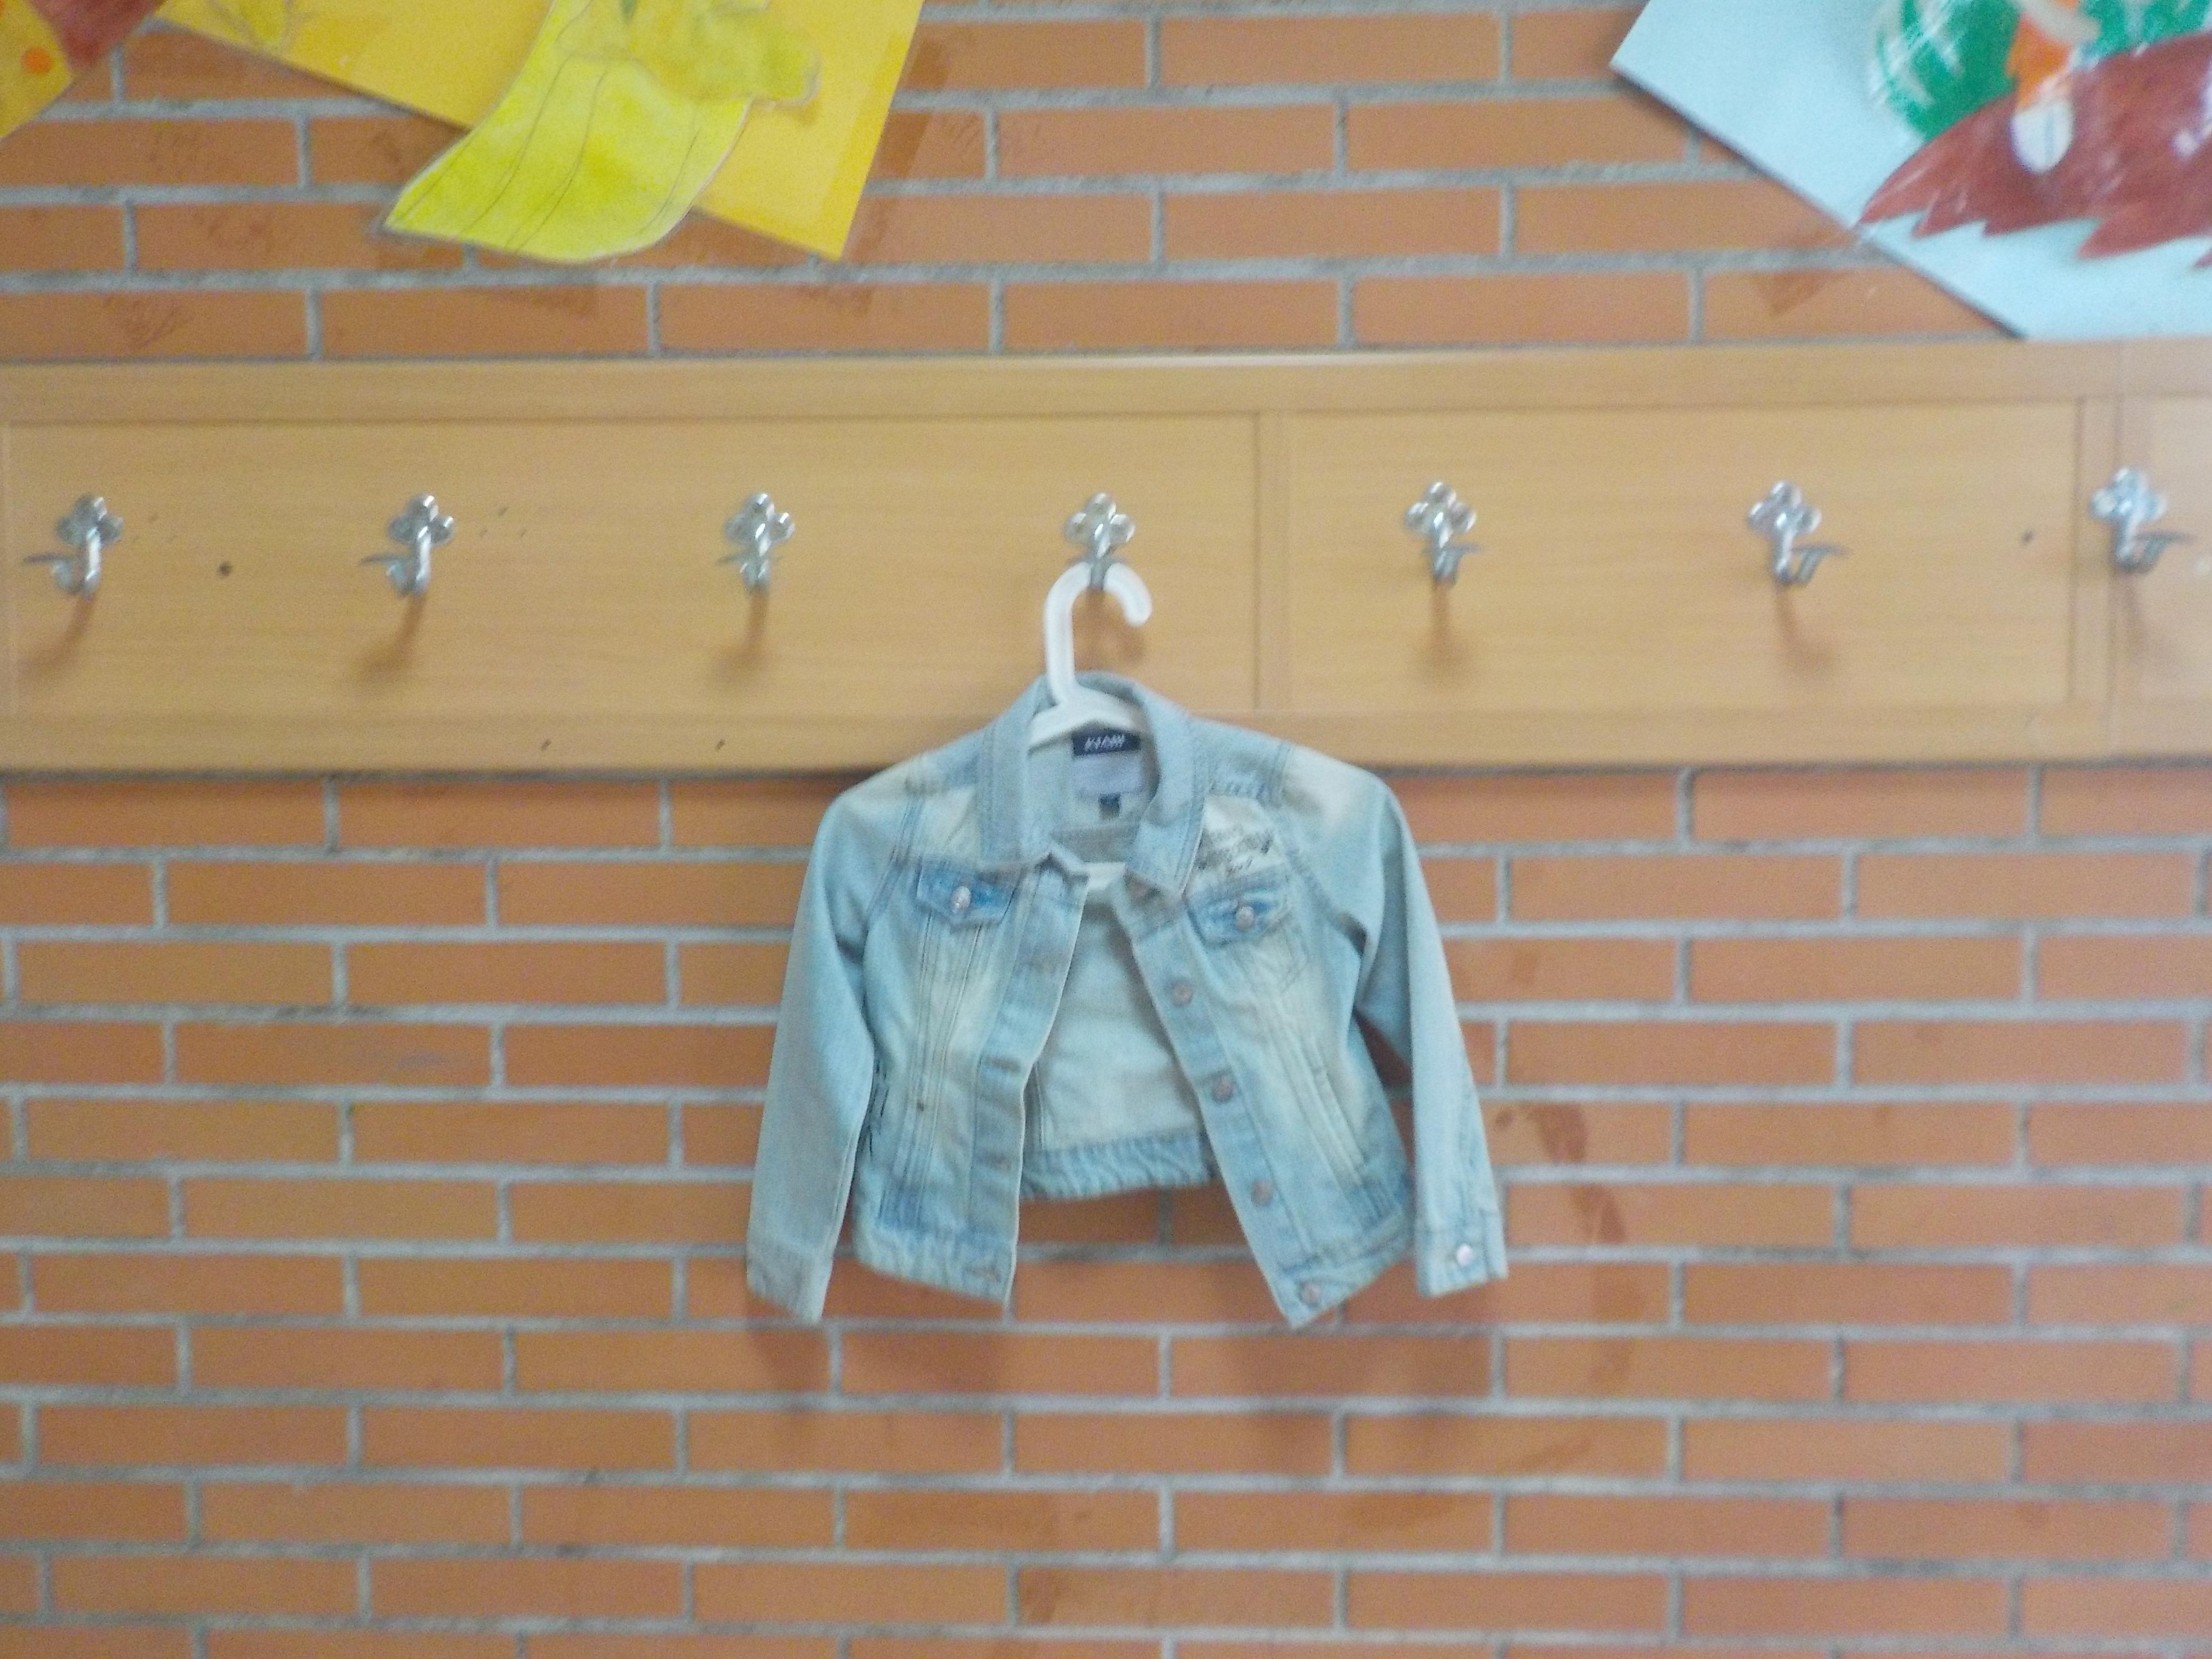 Catalogo de ropa olvidada 2  2018 1